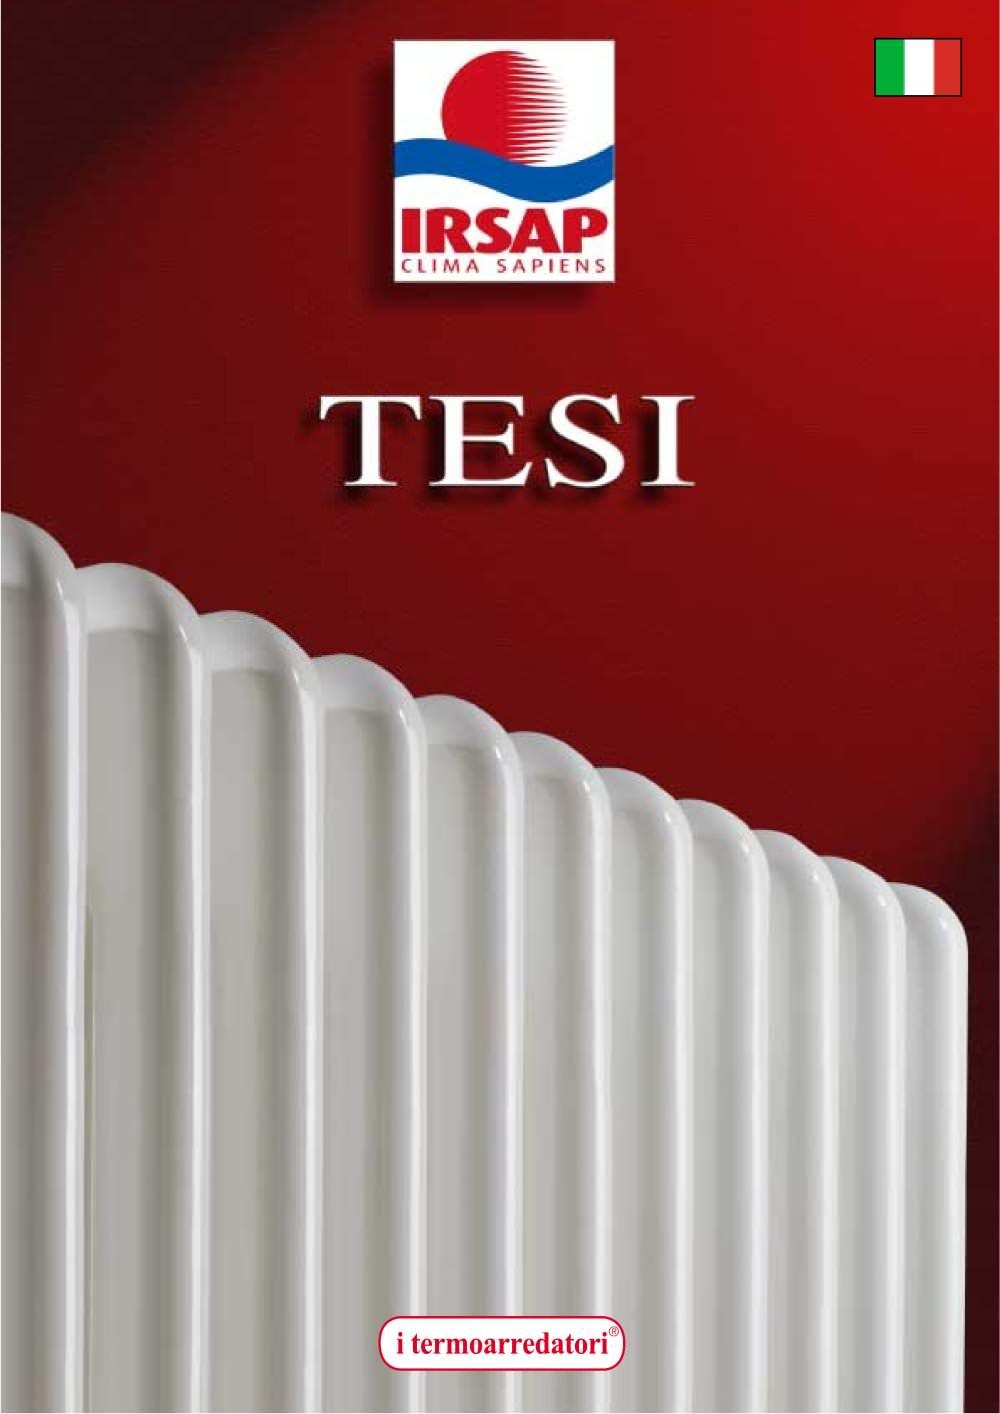 TESI - IRSAP - Catalogo PDF | Documentazione | Brochure